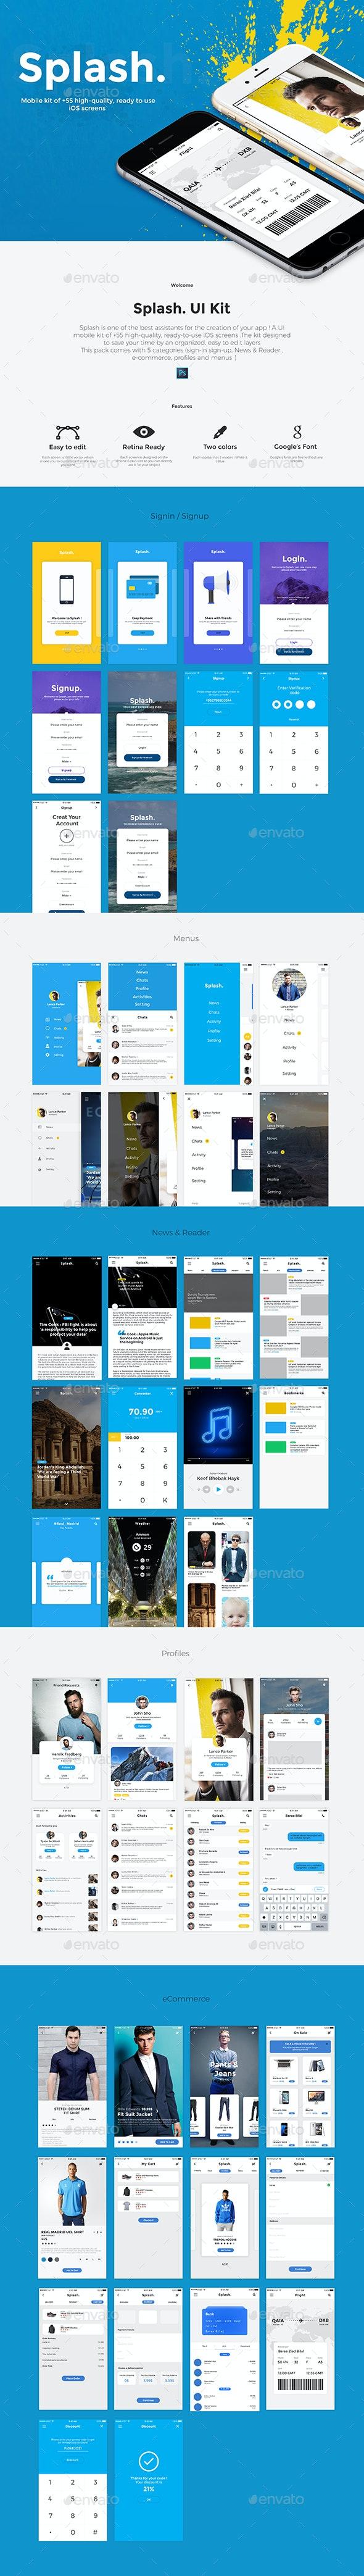 Splash. App UI Kit - User Interfaces Web Elements